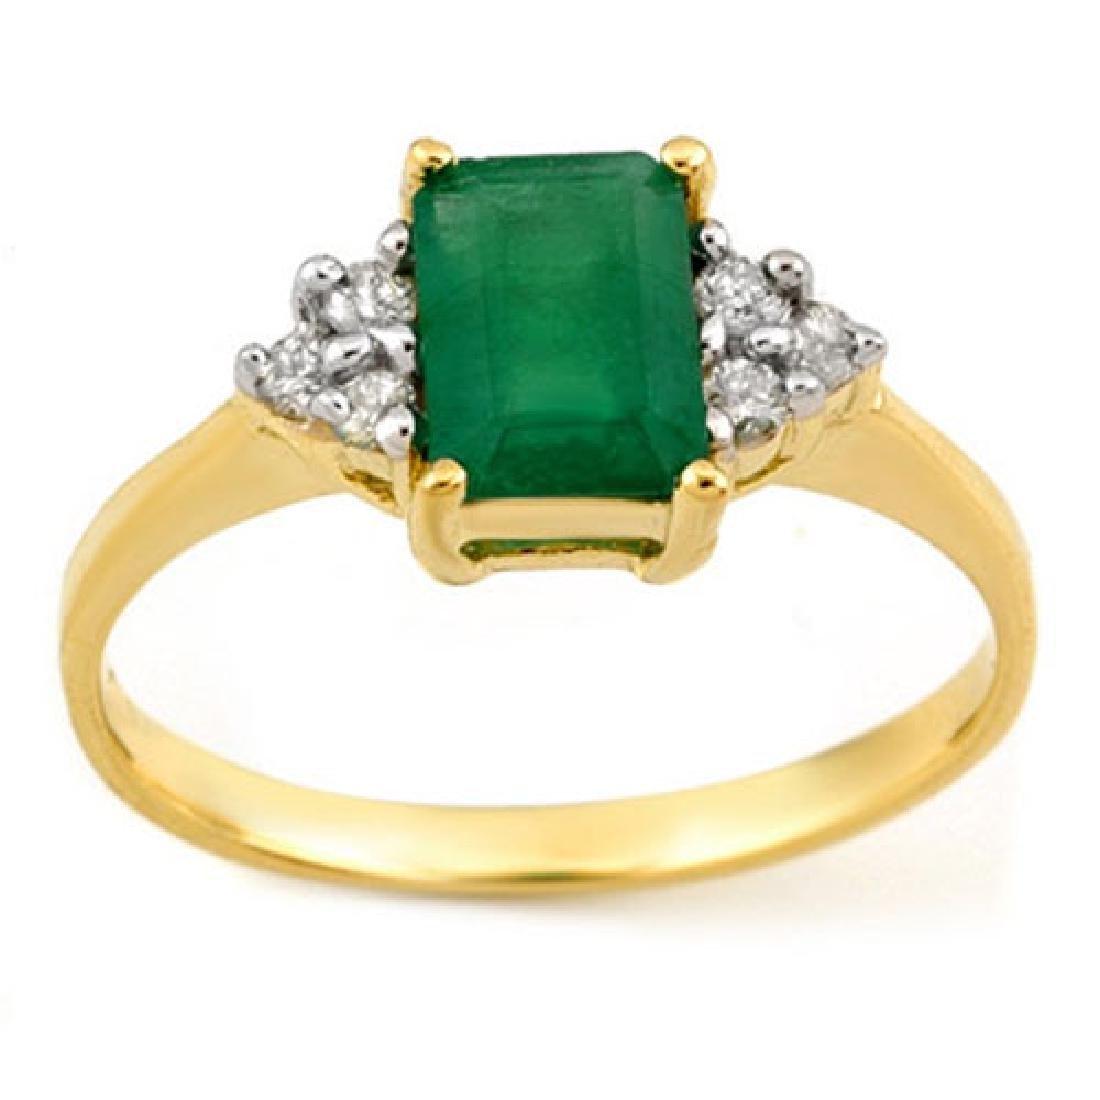 1.12 CTW Emerald & Diamond Ring 10K Yellow Gold